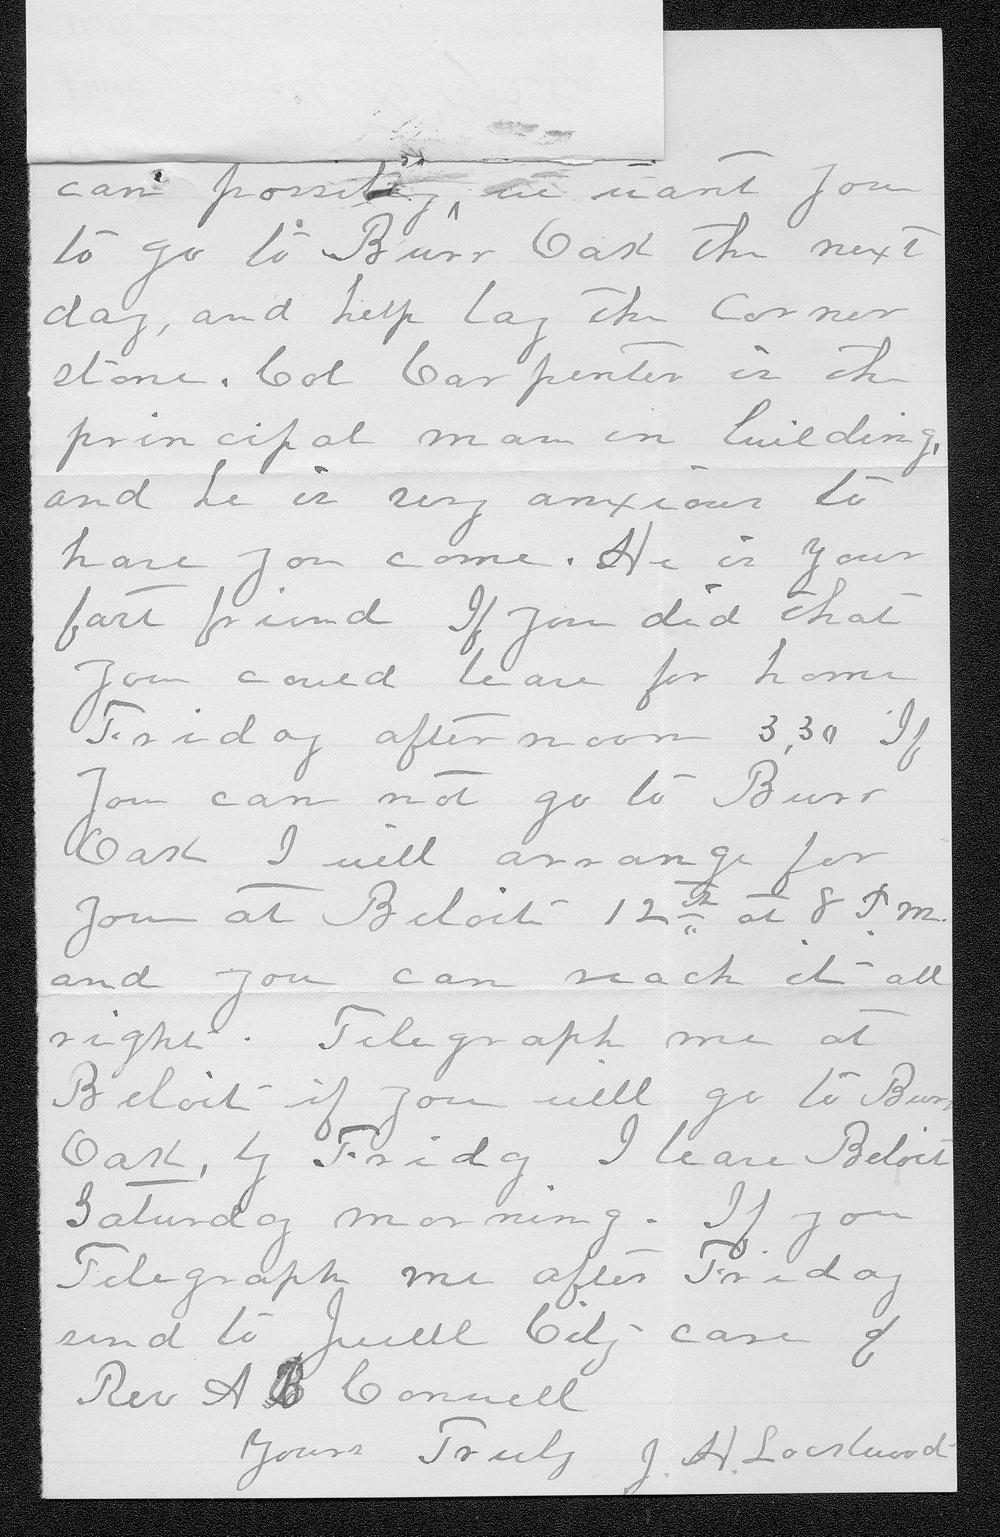 J. H. Lockwood to Governor John St. John - 2